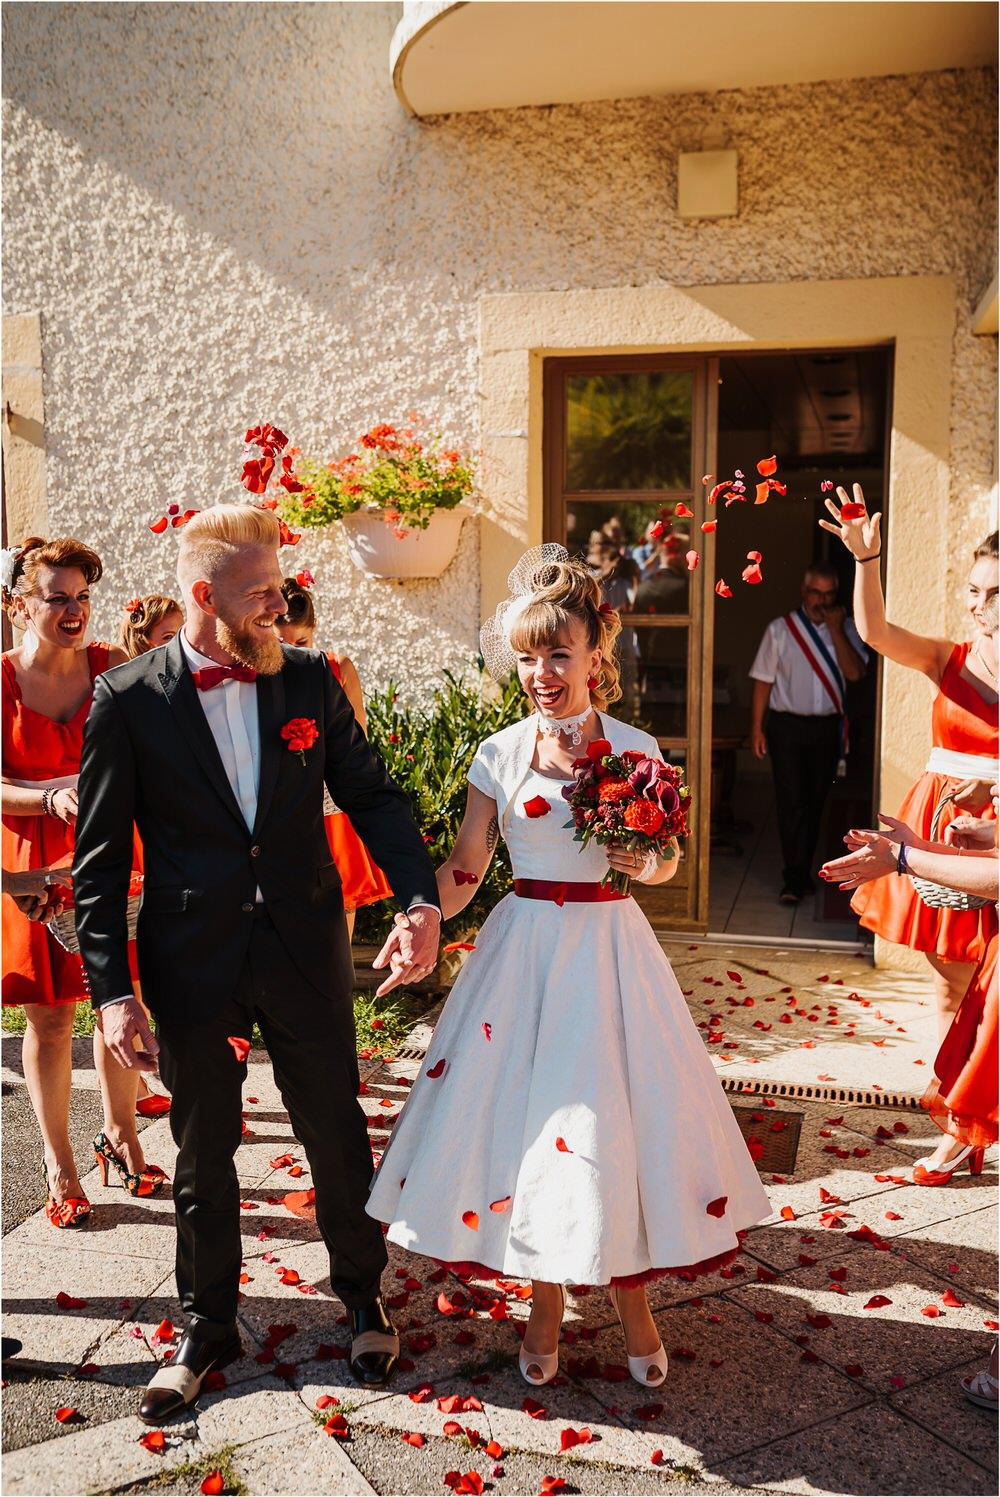 evian france wedding photographer photographer hotel royale rockabilly wedding poroka tematska nika grega themed wedding 0047.jpg